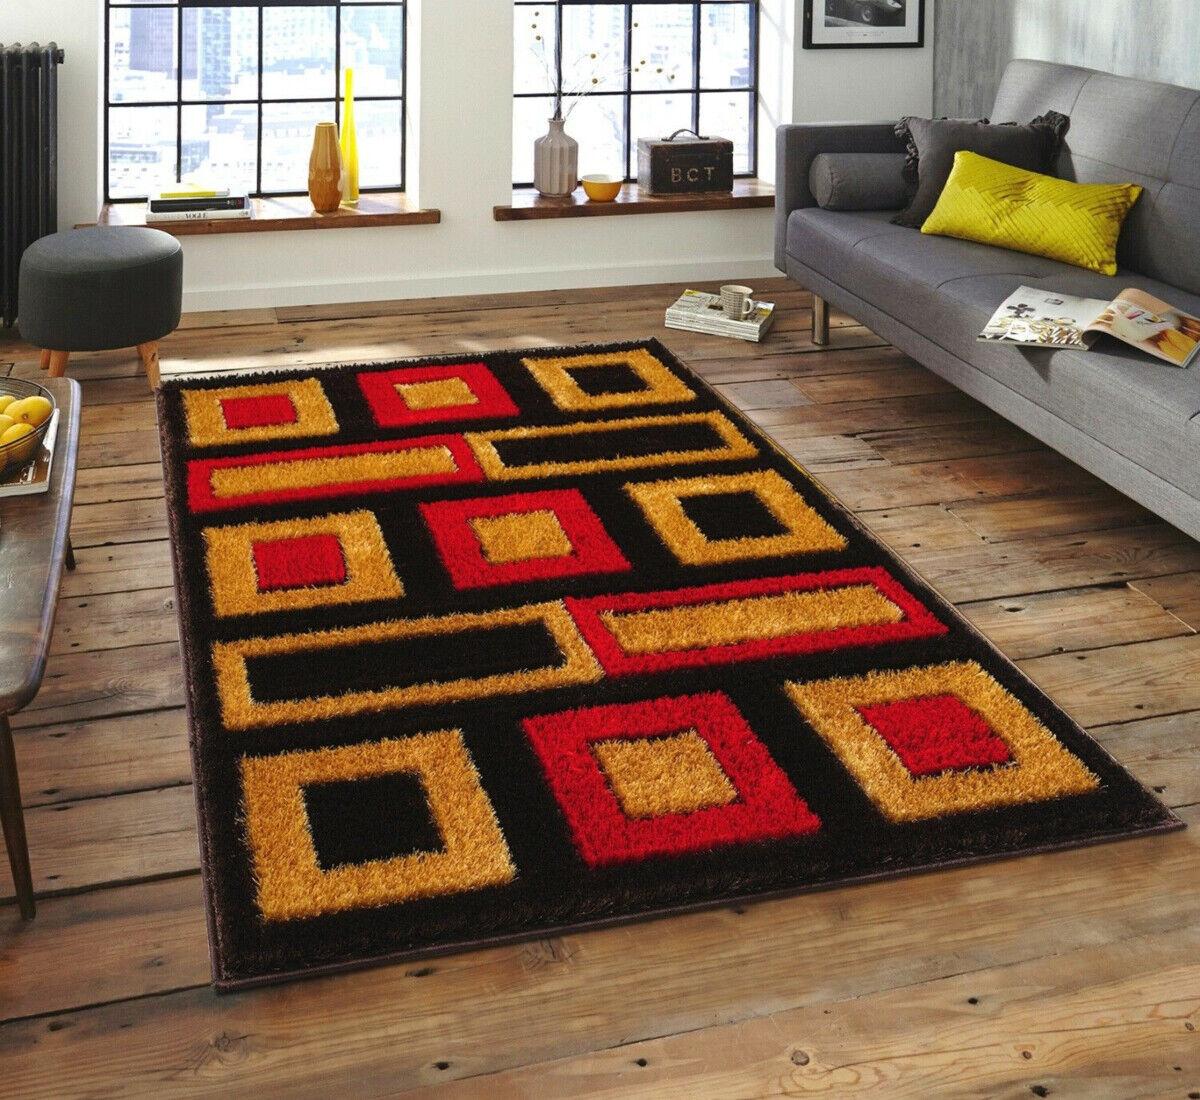 Floor Rug Carpet Runner Room Dining Kitchen Kitchen Kitchen Office Area Mat Small Large Medium 9eb78e